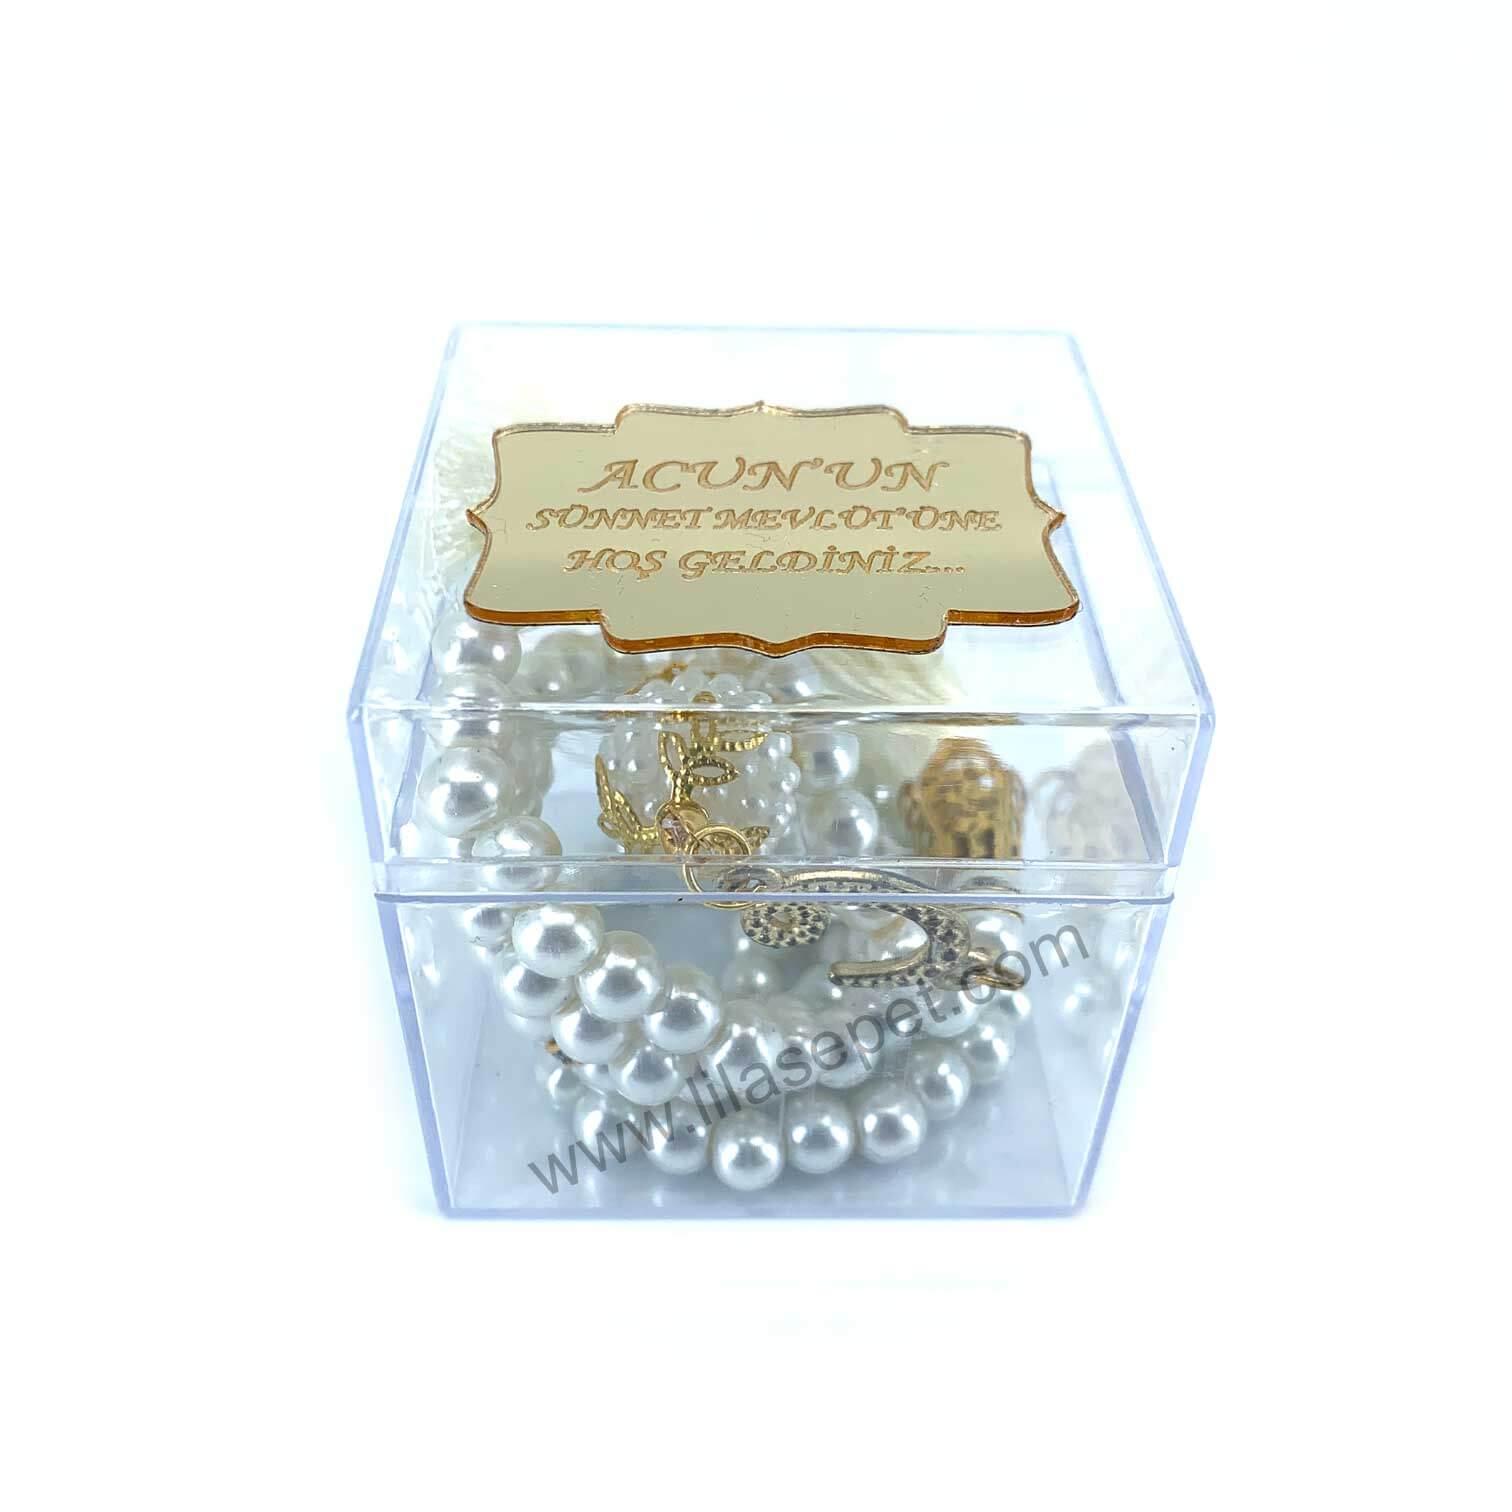 Ana Sayfa sari kare seffaf inci tesbih kutusu pleksi isim etiketli mevlut hediyesi